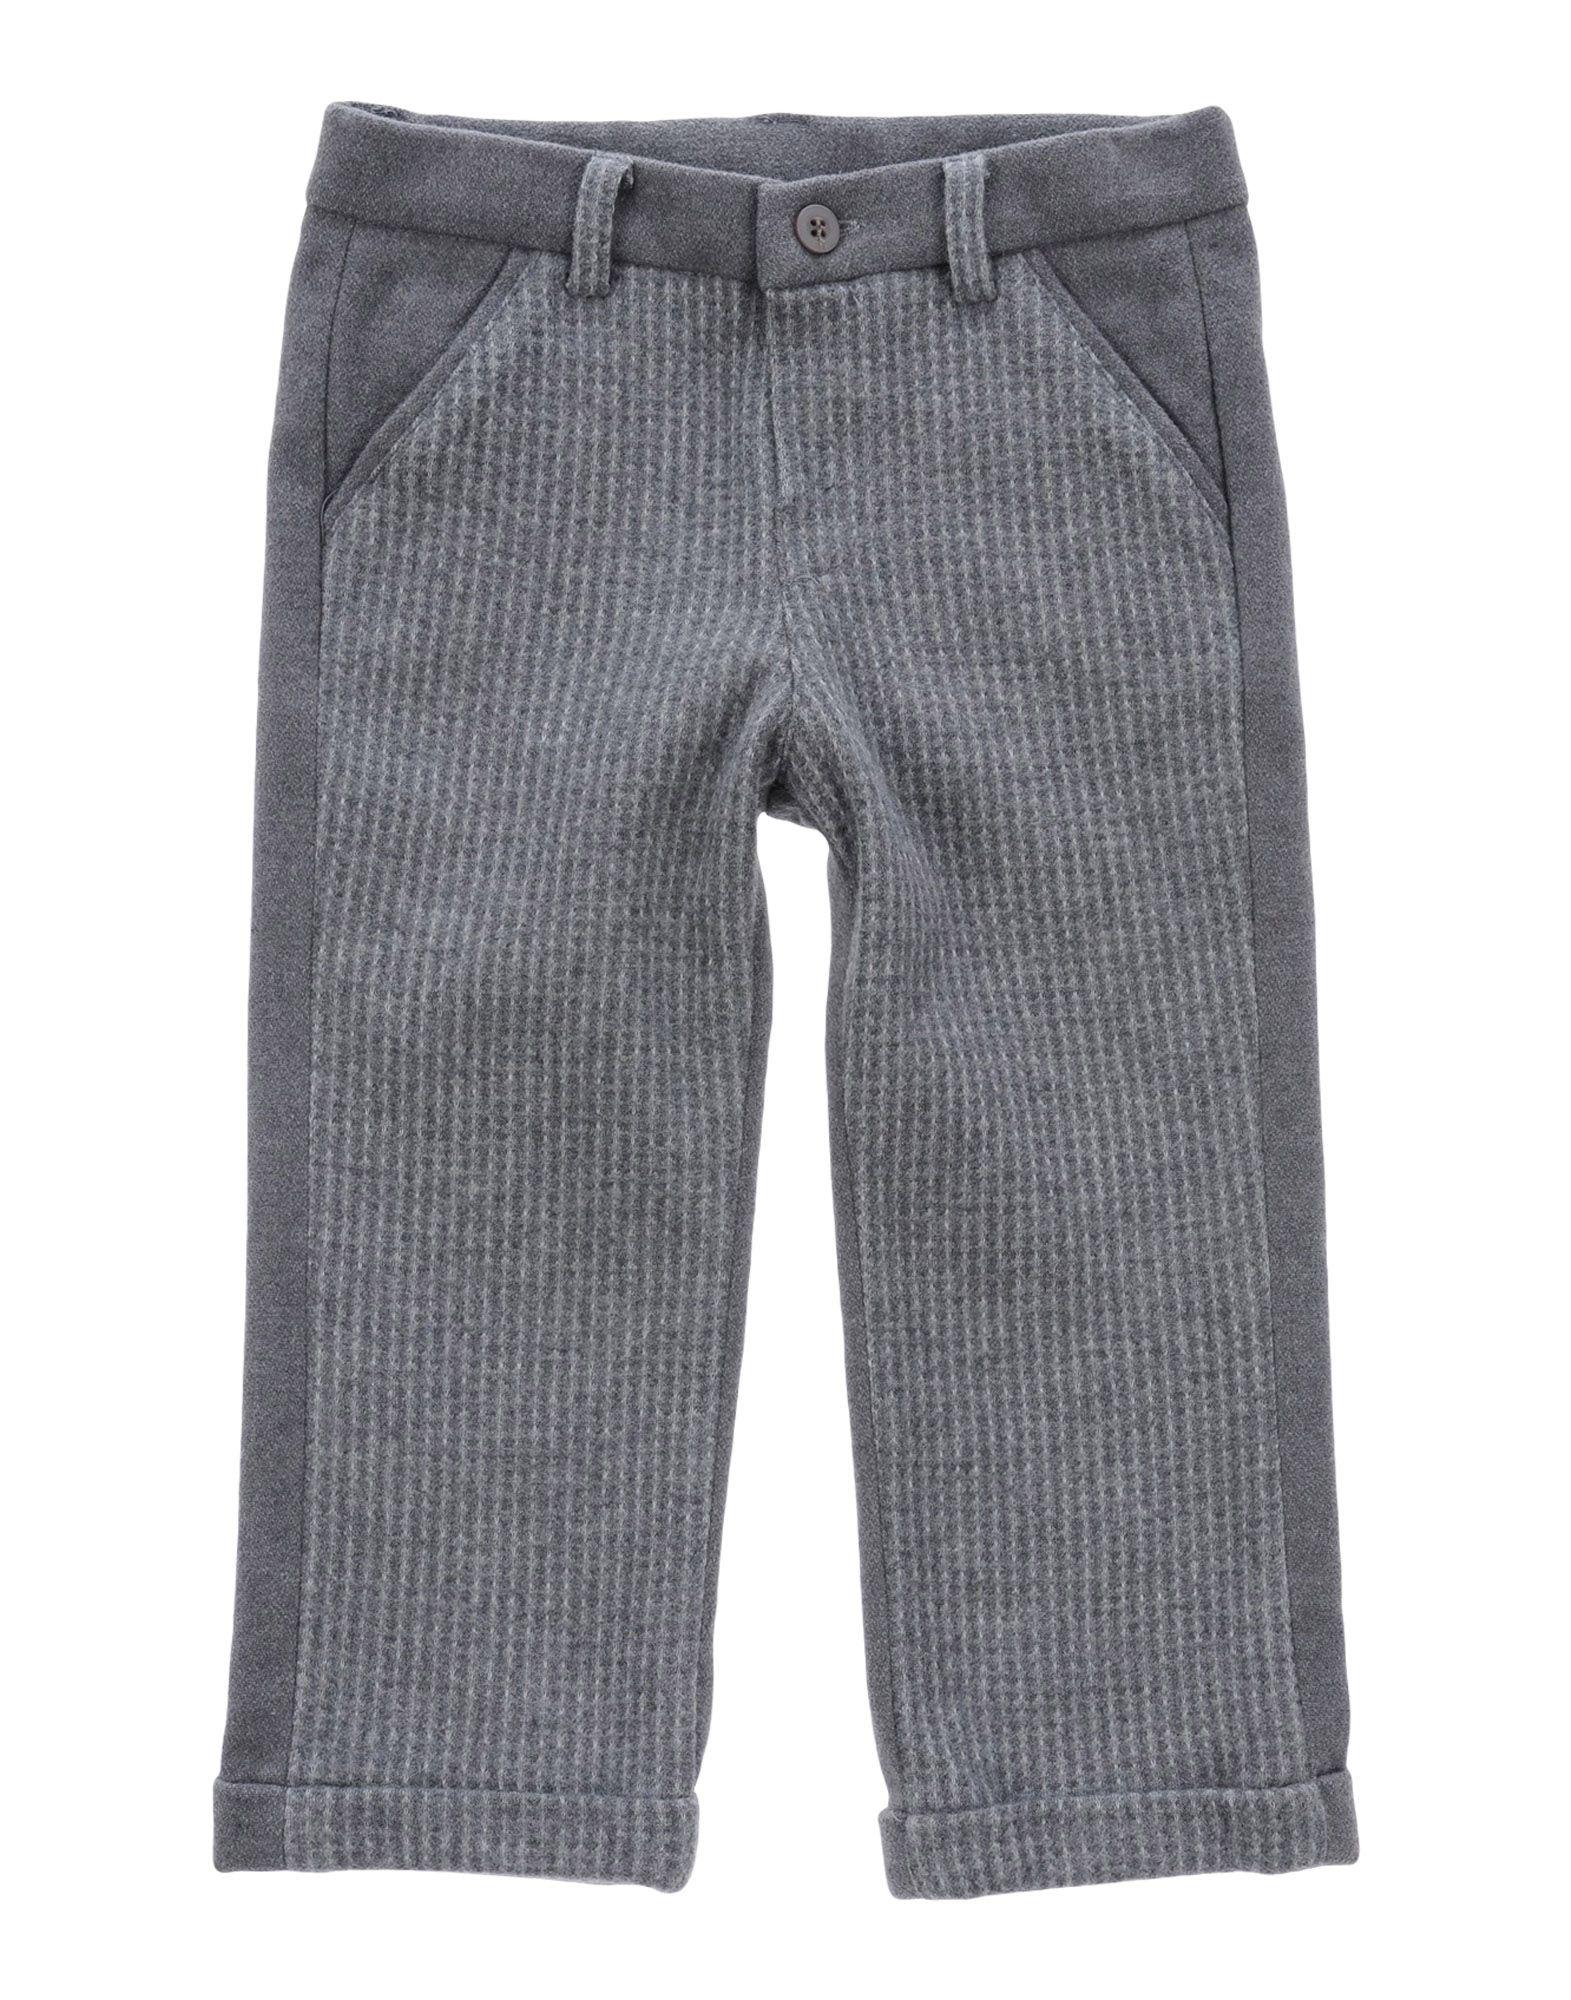 Kid Space Kids' Casual Pants In Gray